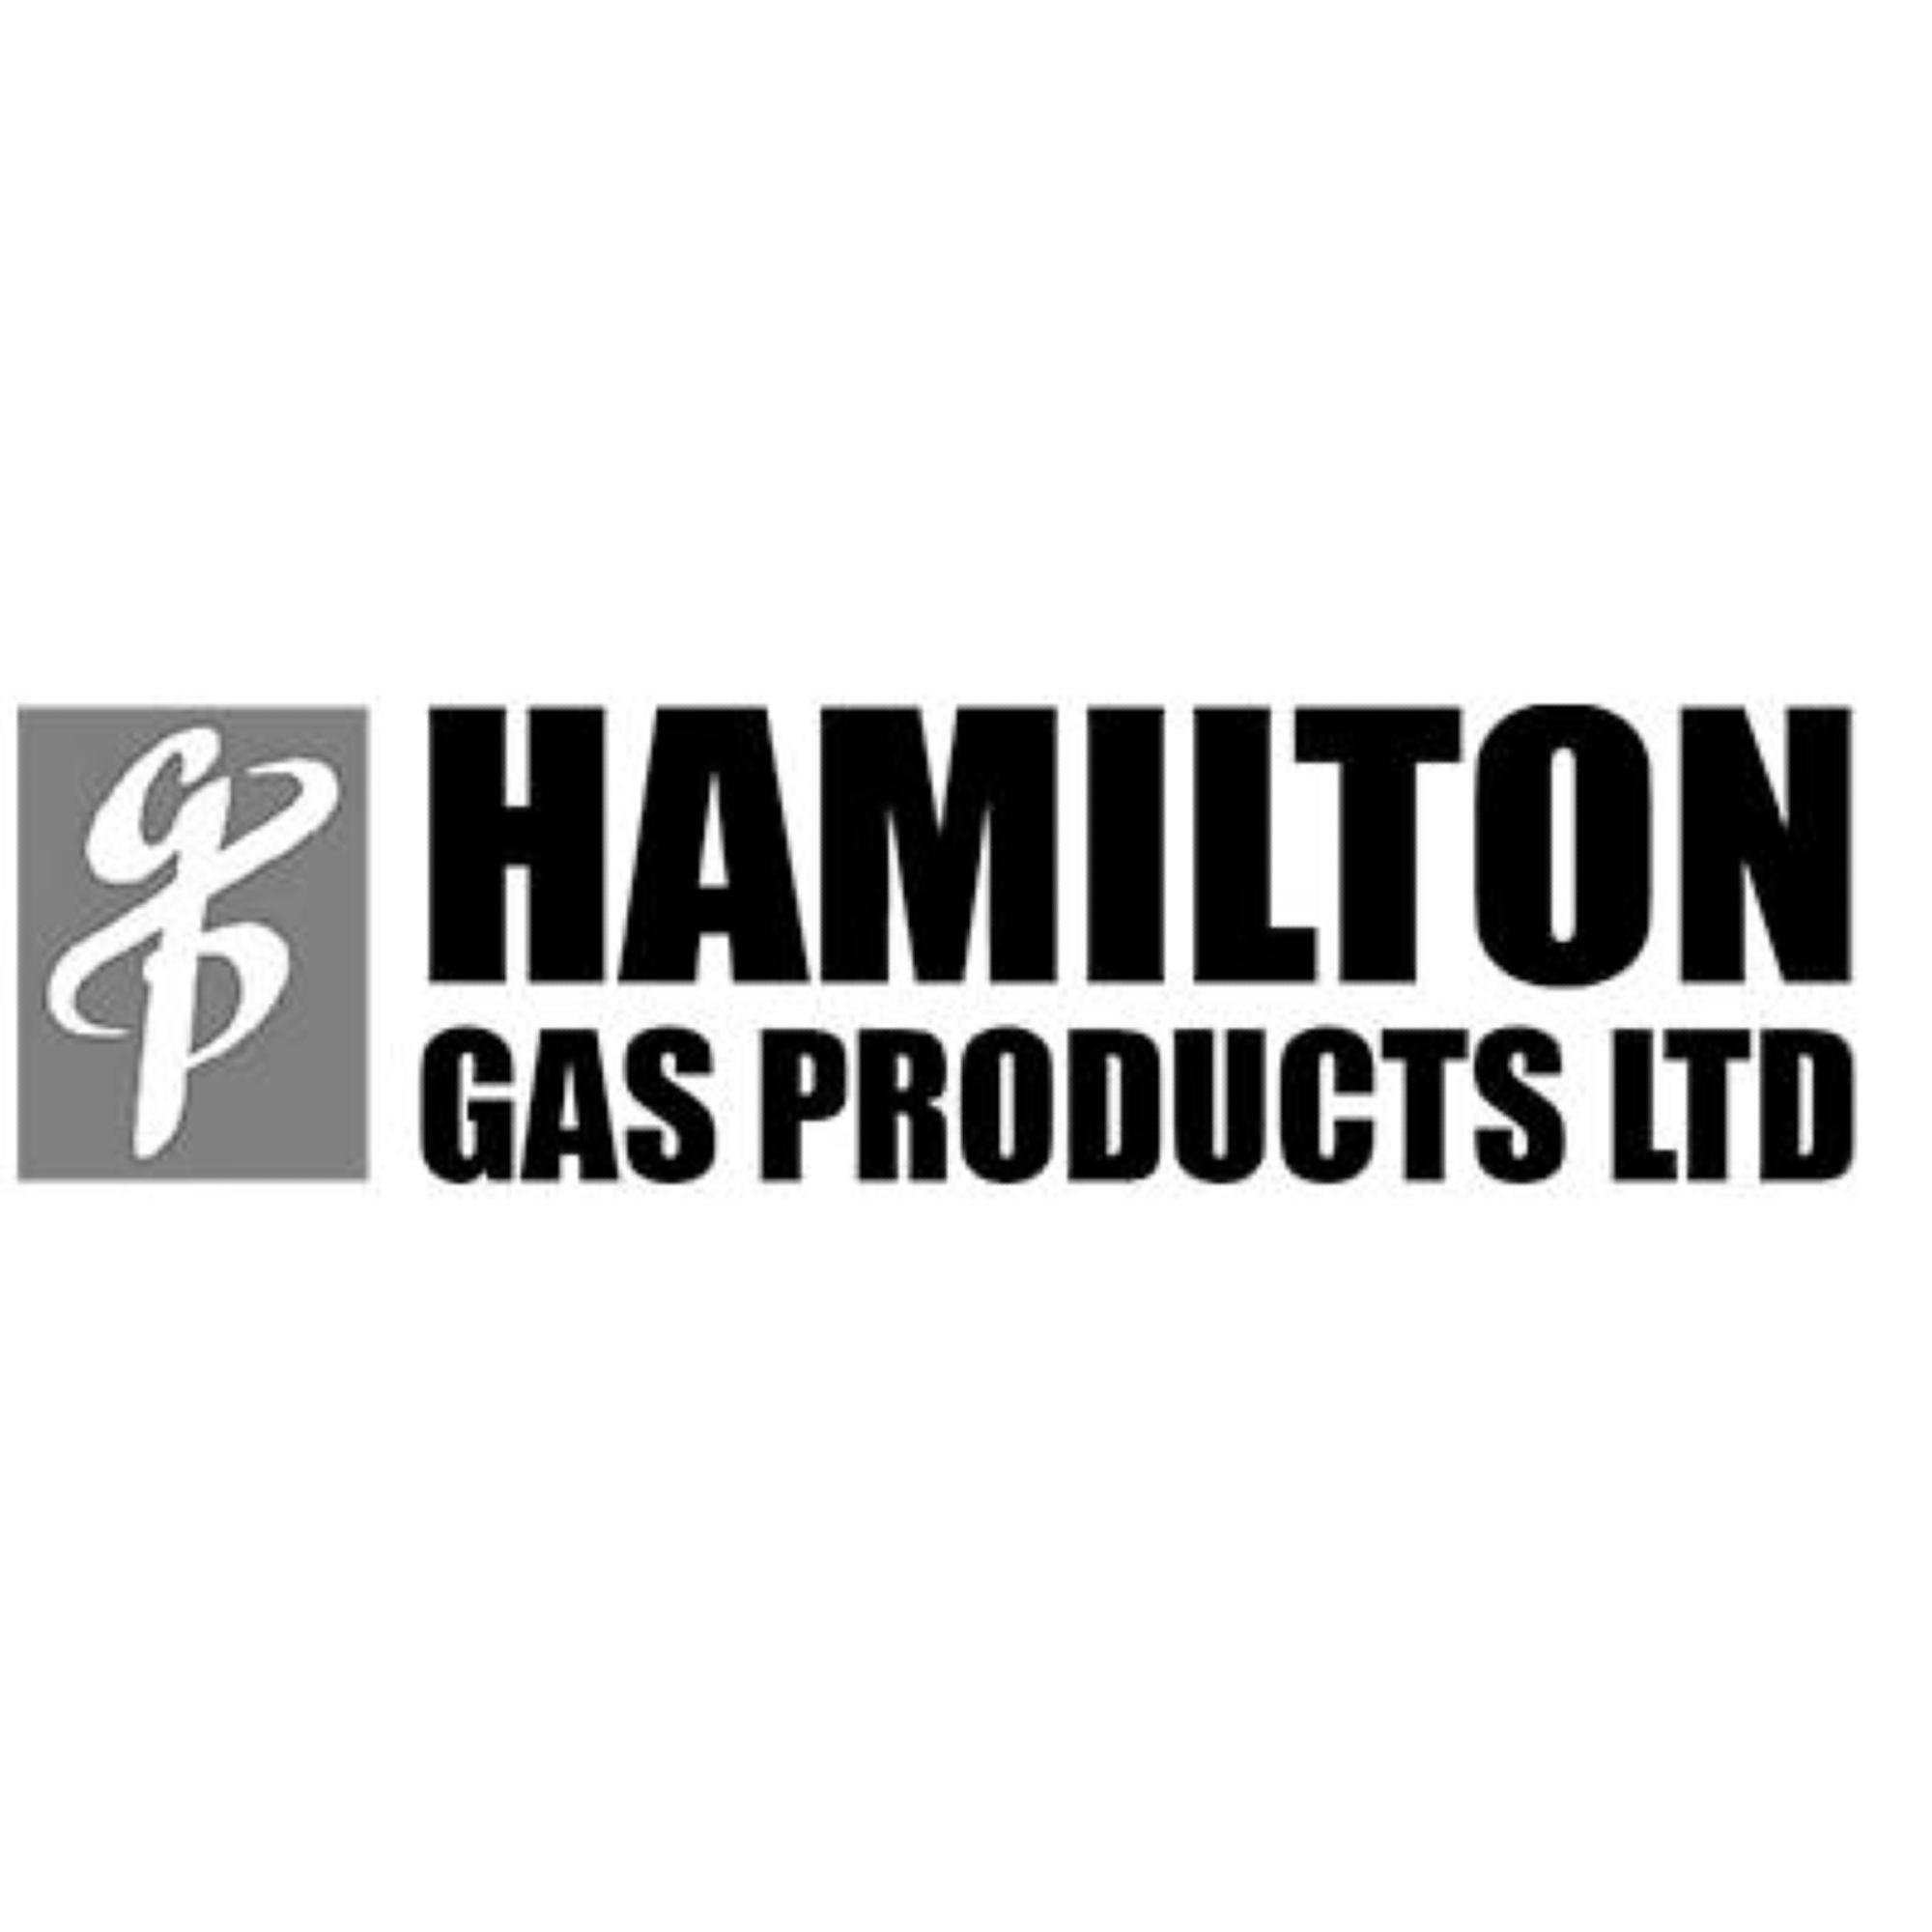 hamilton_gas_logo.jpg